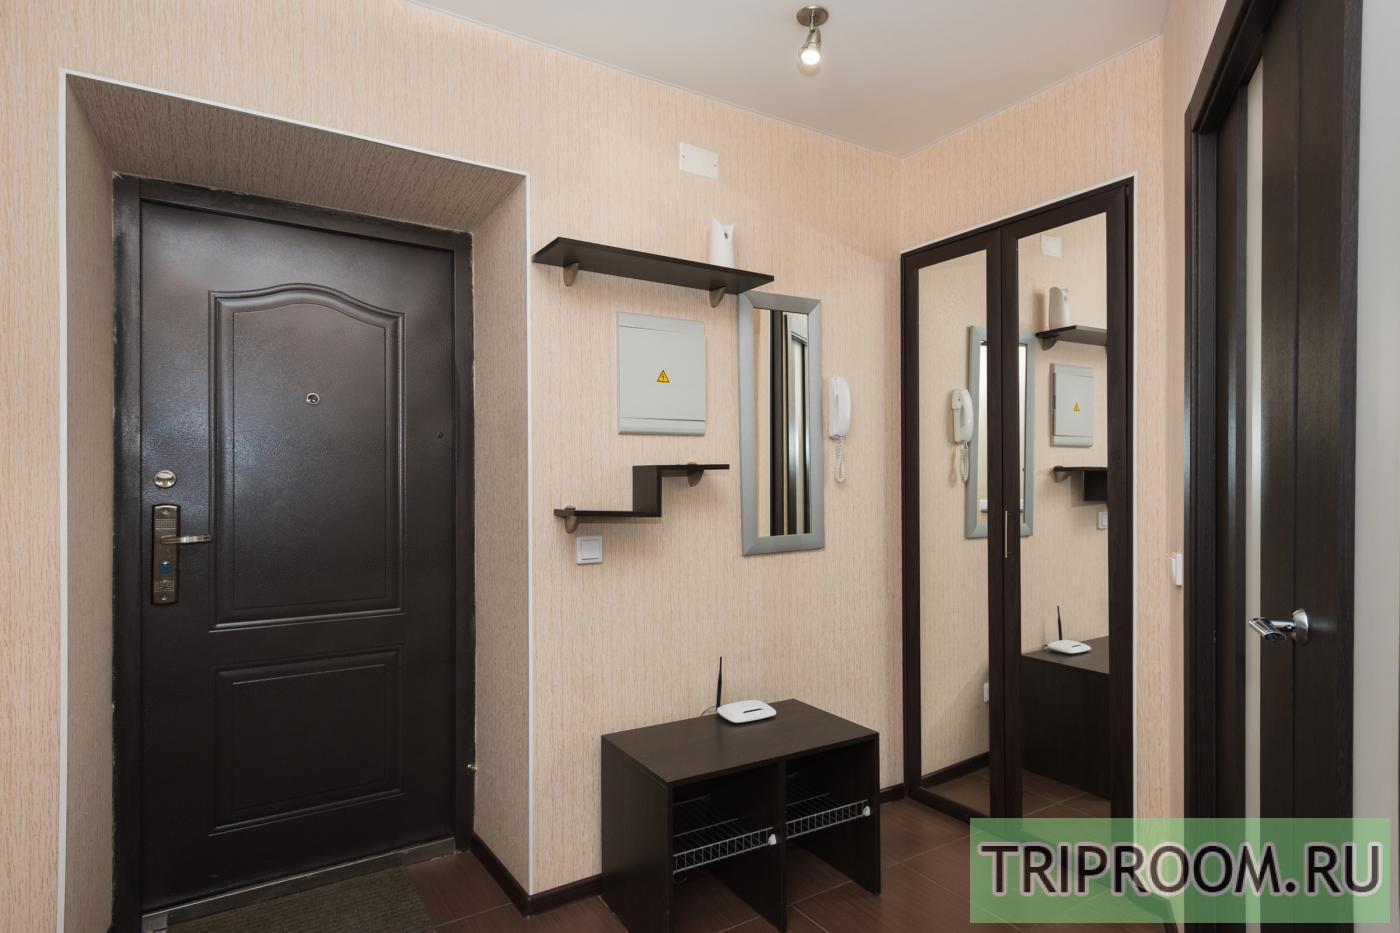 1-комнатная квартира посуточно (вариант № 16259), ул. Смазчиков улица, фото № 5